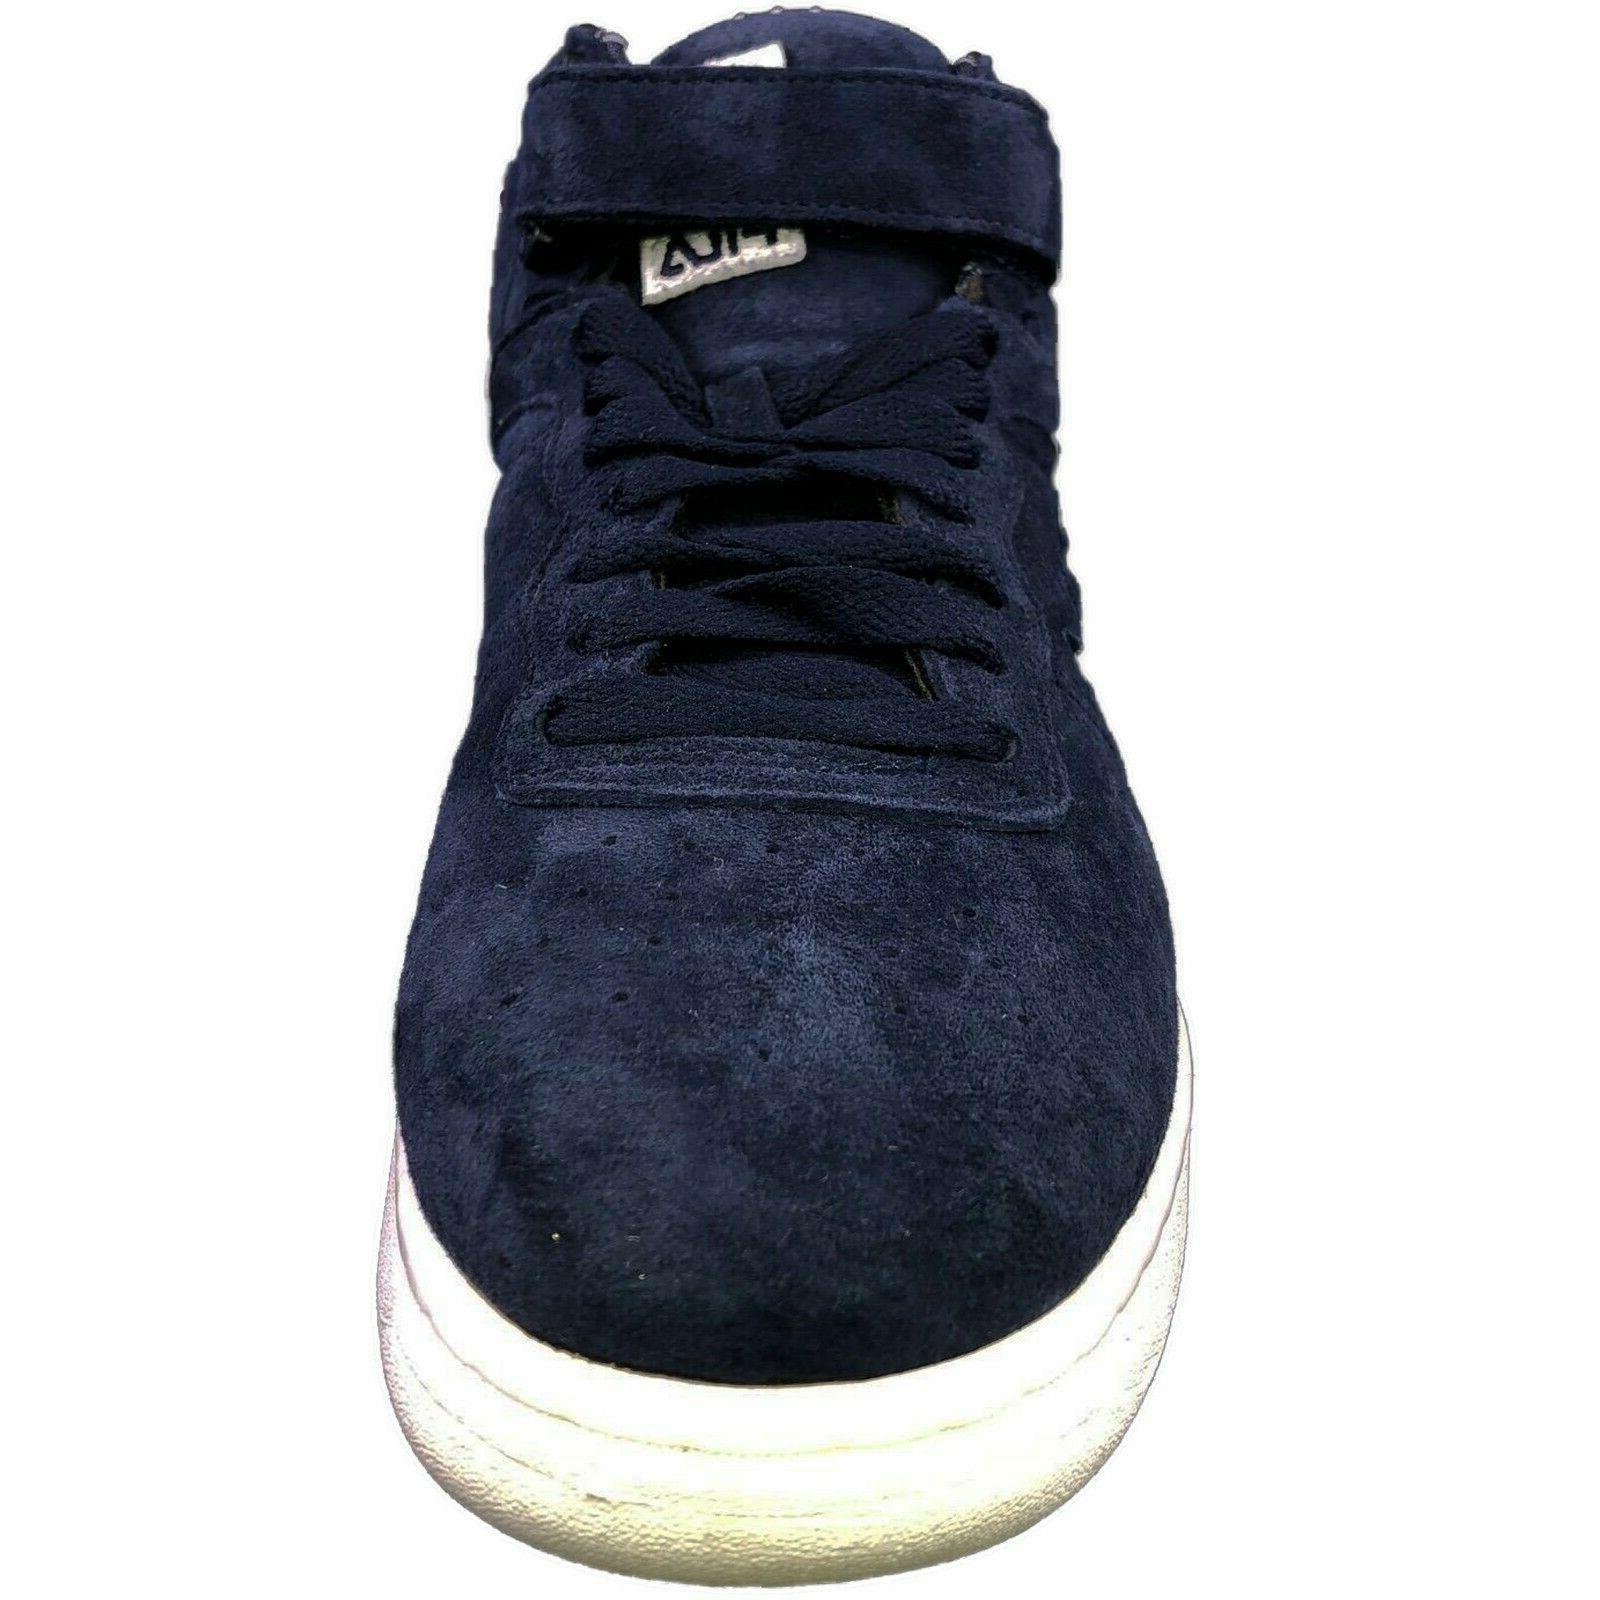 Fila Men's 13 PS Pinstripe High Mid Basketball Shoes